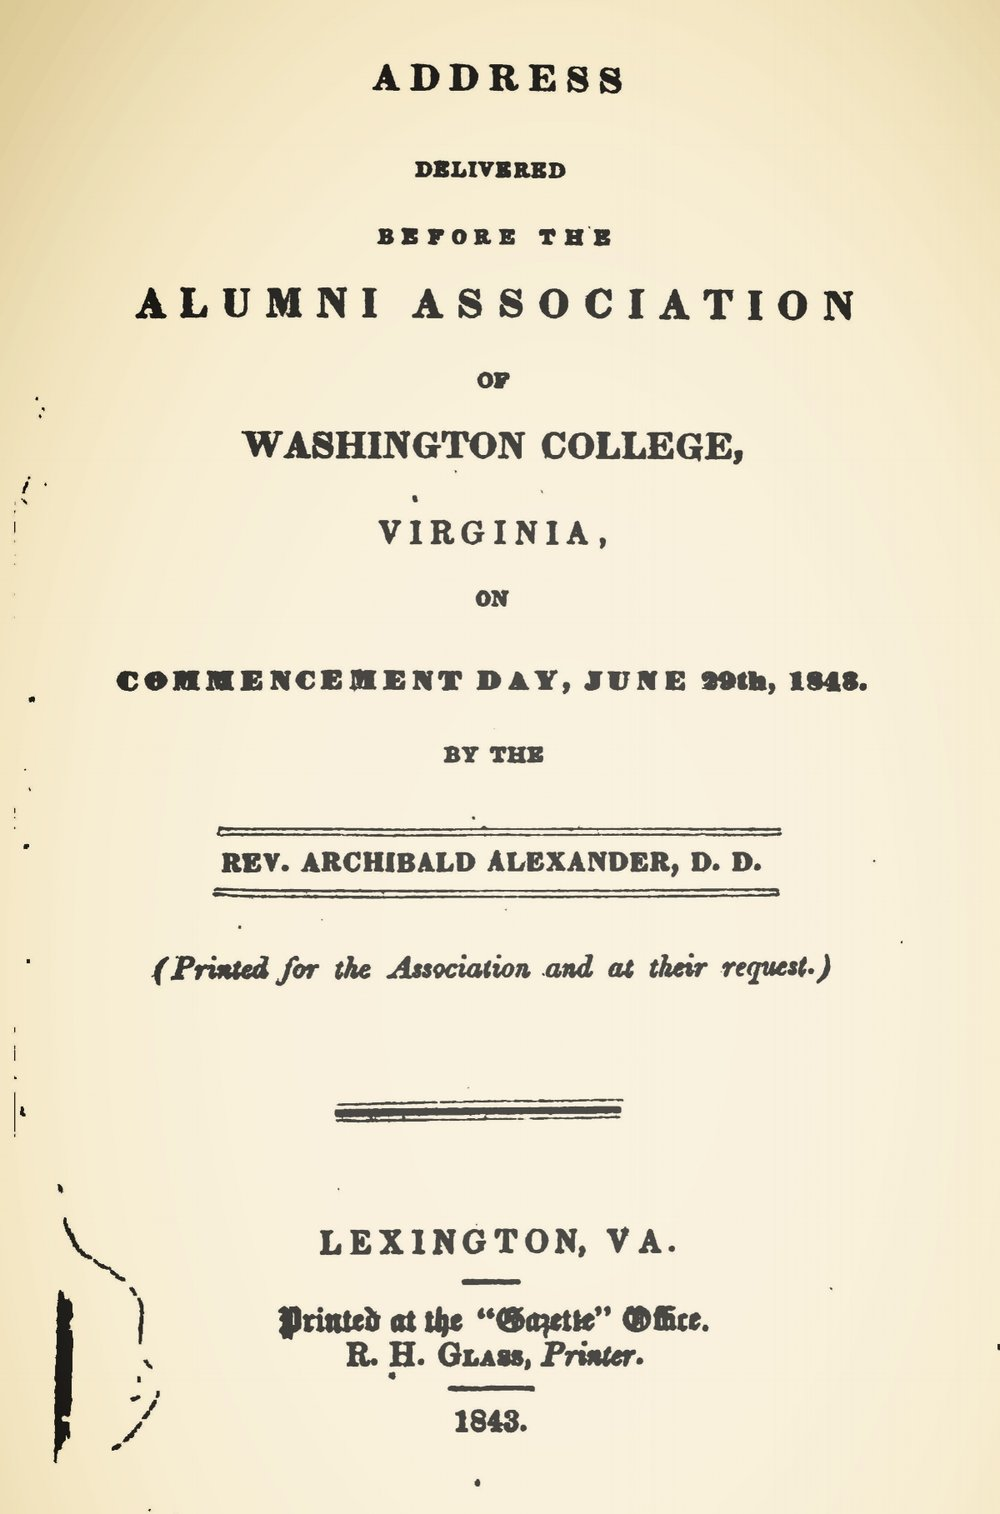 Alexander, Archibald, Address Delivered Before the Alumni Association of Washington College Title Page.jpg